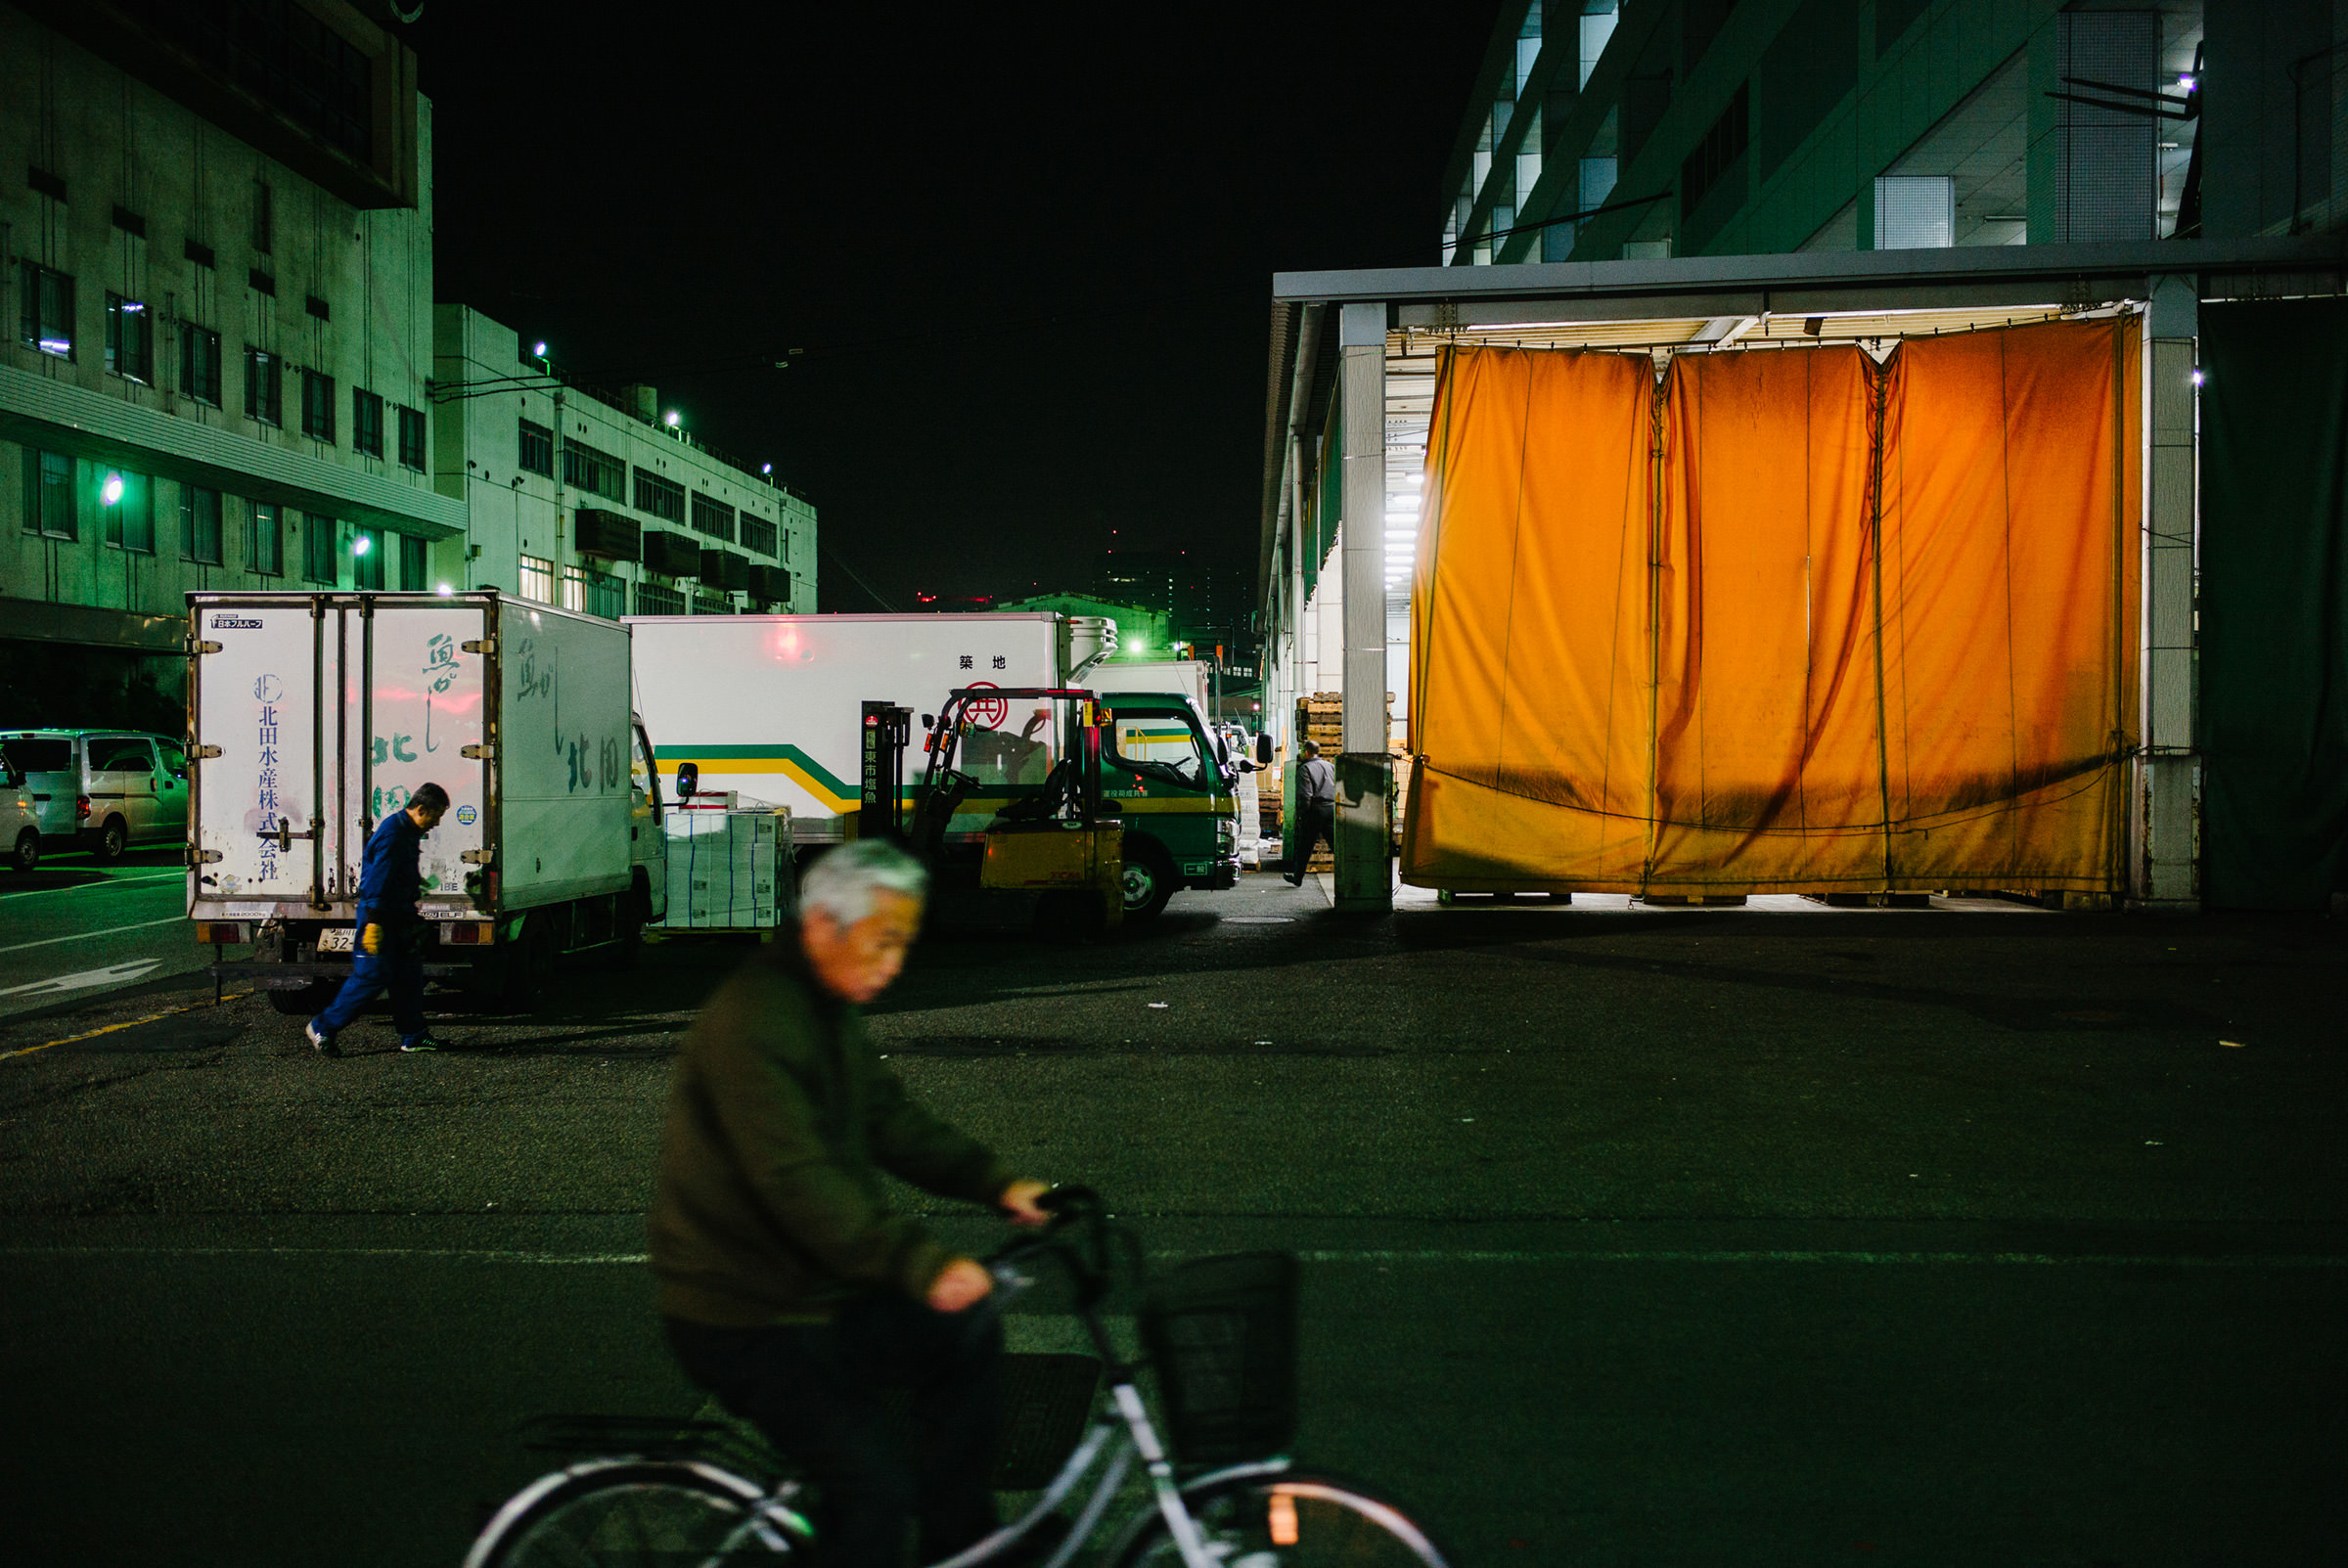 brandon_patoc_travel_japan_worldwide_photographer0004.jpg